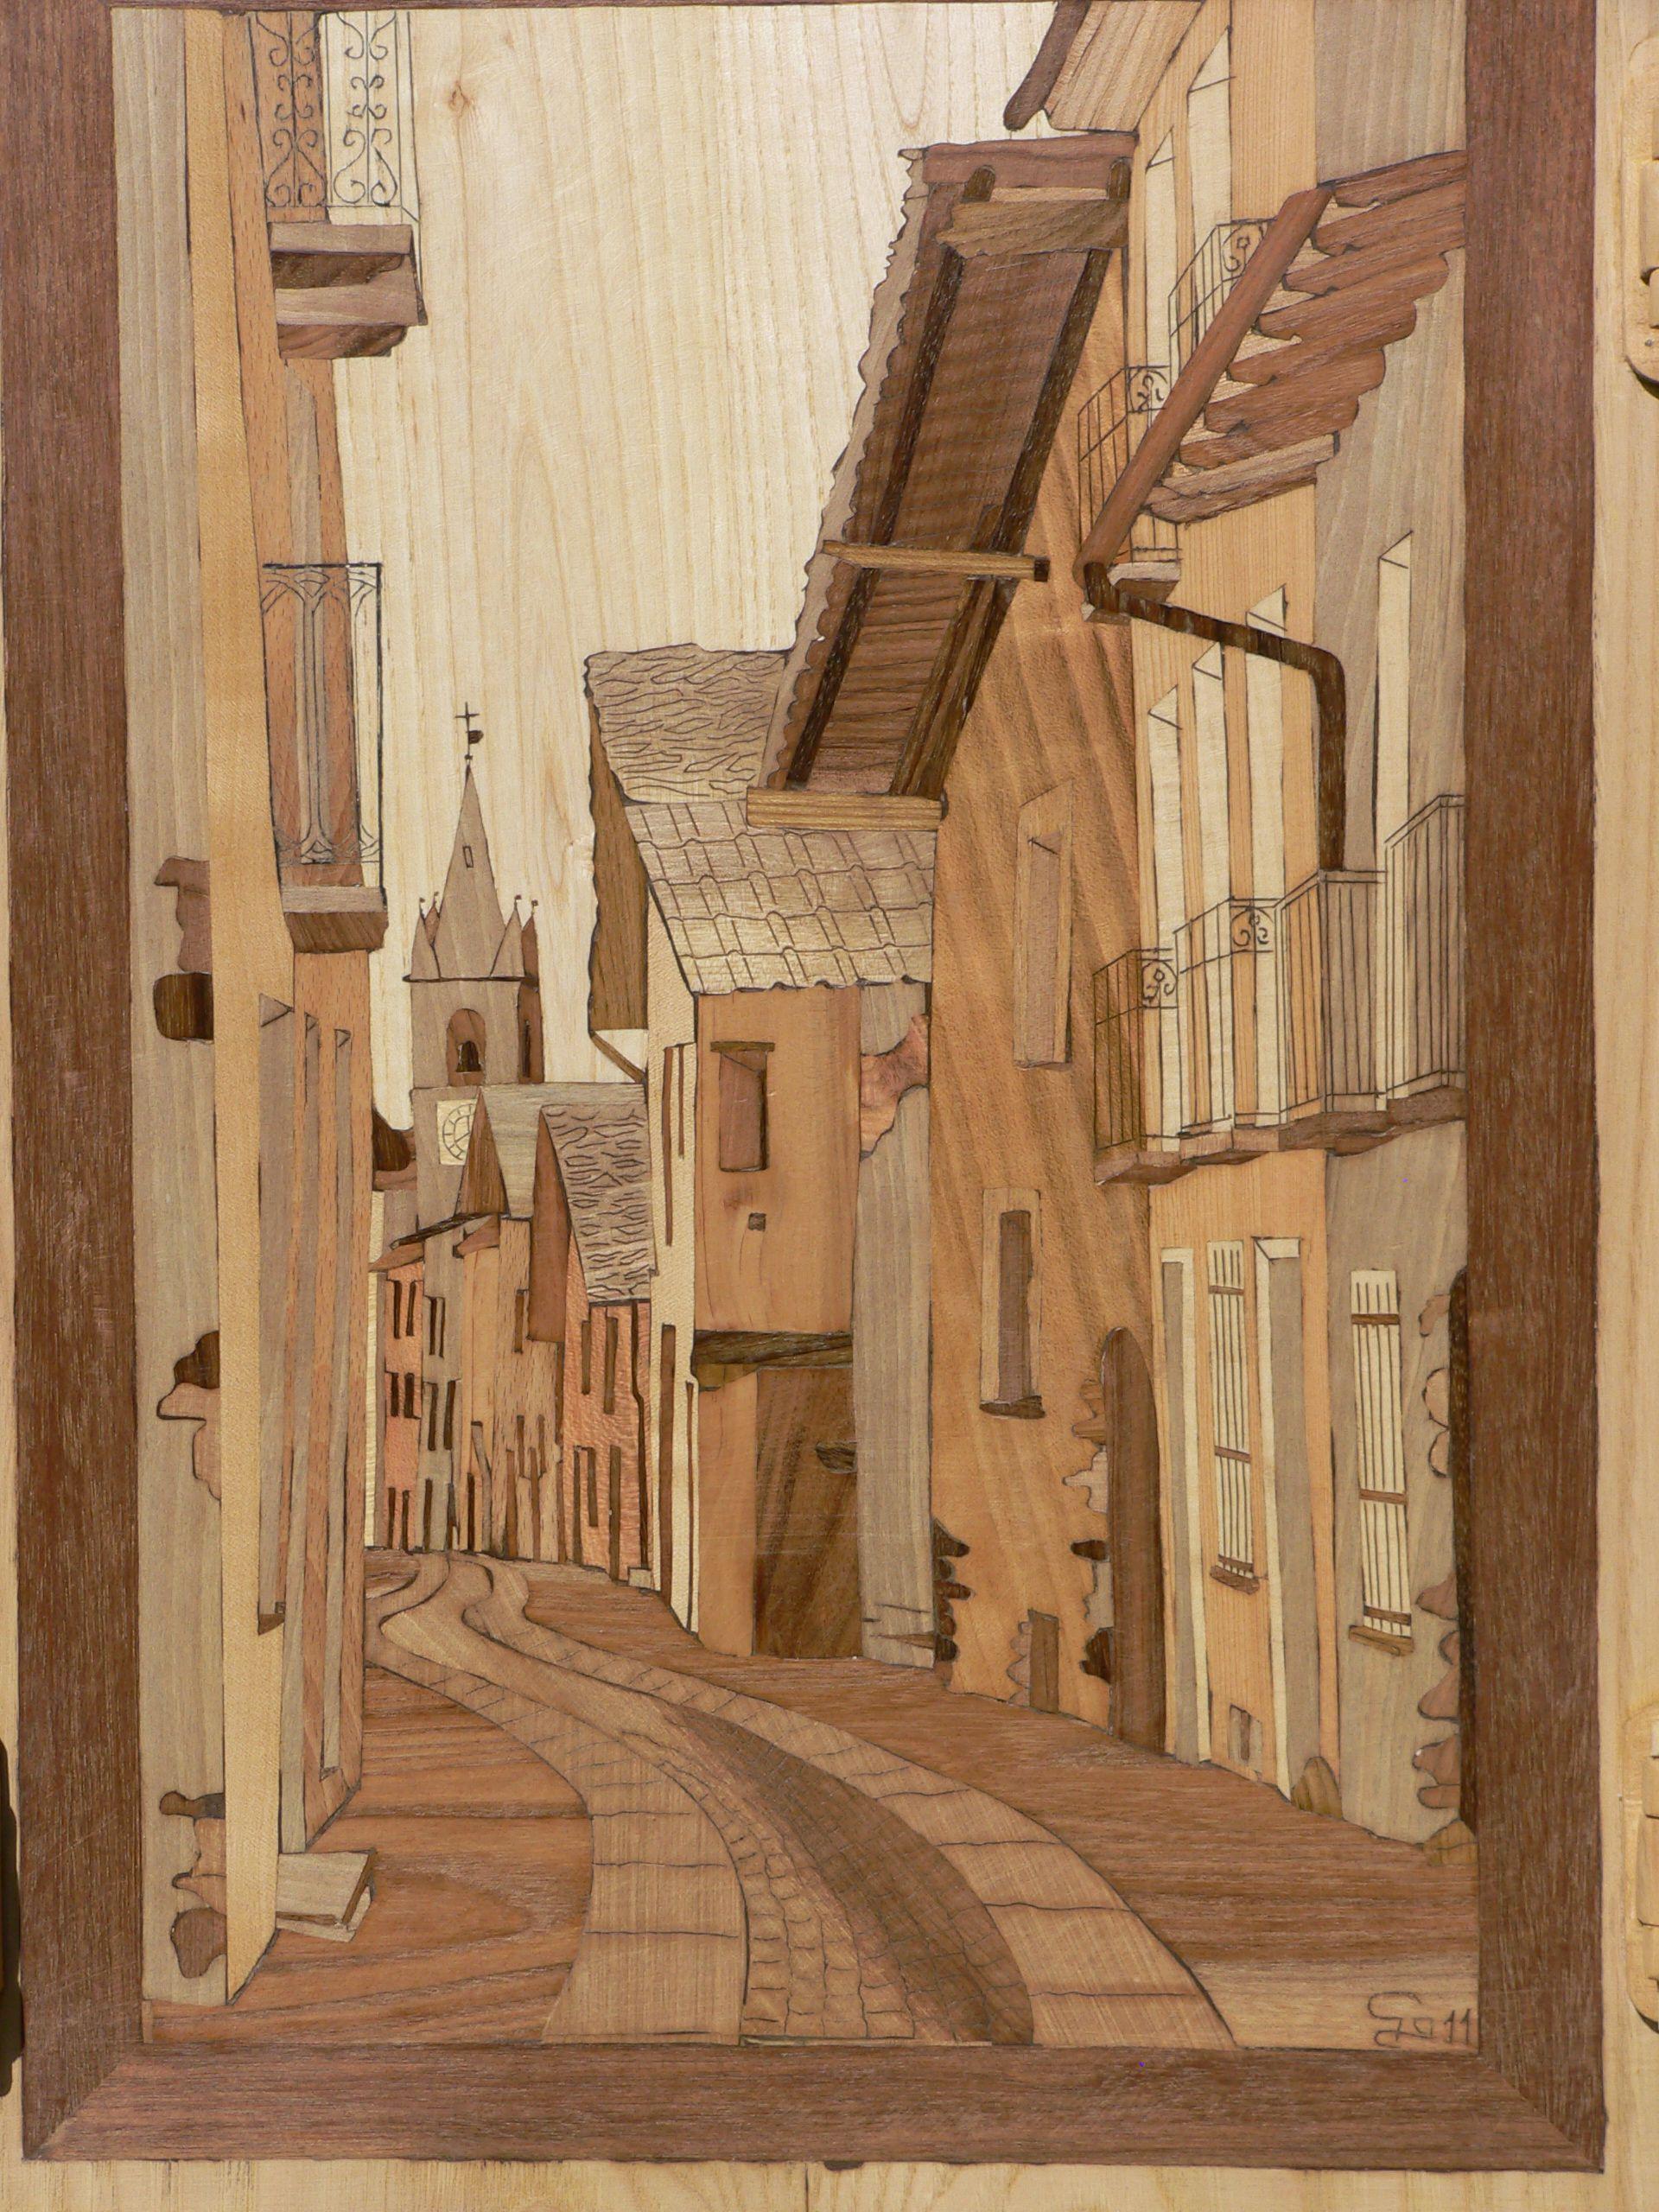 Novalesa Via Maestra Intarsio In Legno Di Colori Naturali Spessore Tarsie 5 Mm Intarsia Wood Lath Art Wood Art